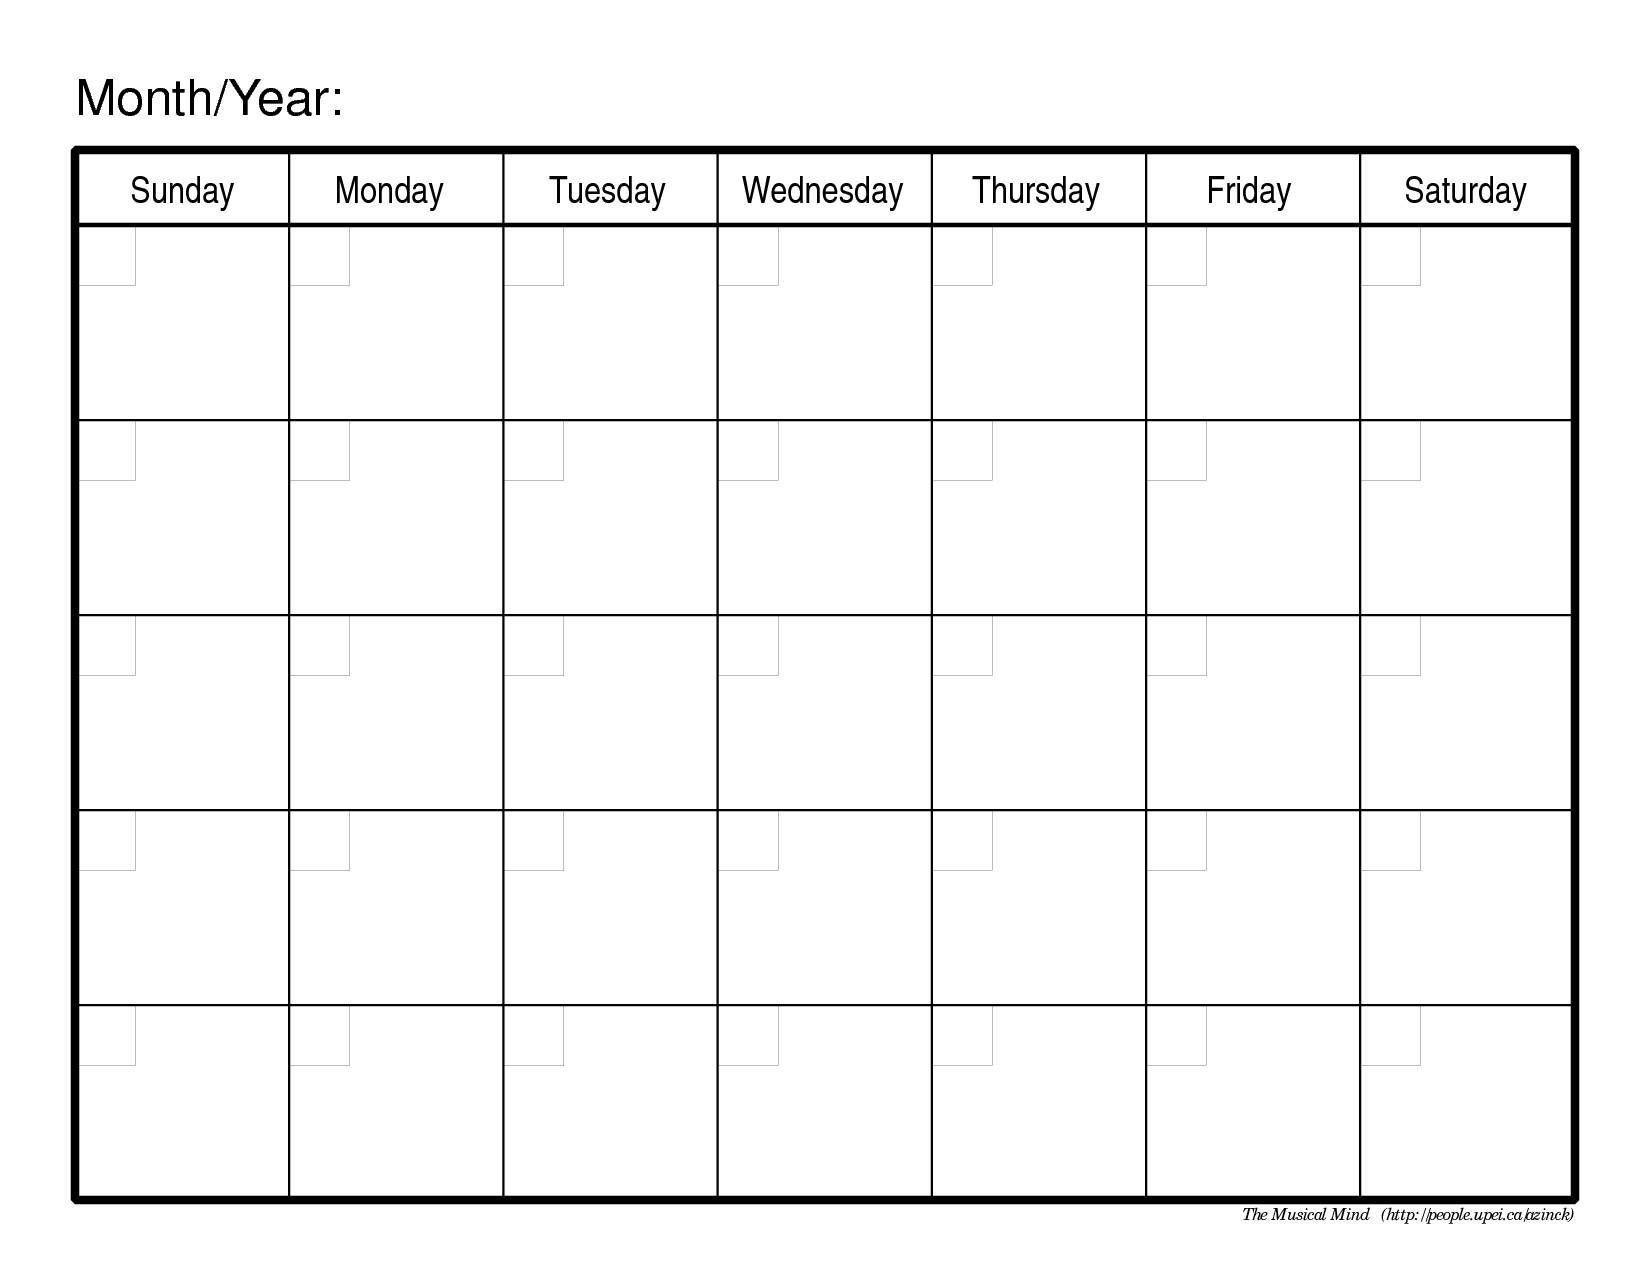 Free Printable Monthly Calendar Templates | Hauck Mansion in Blank Monthly Calendar Printable Template